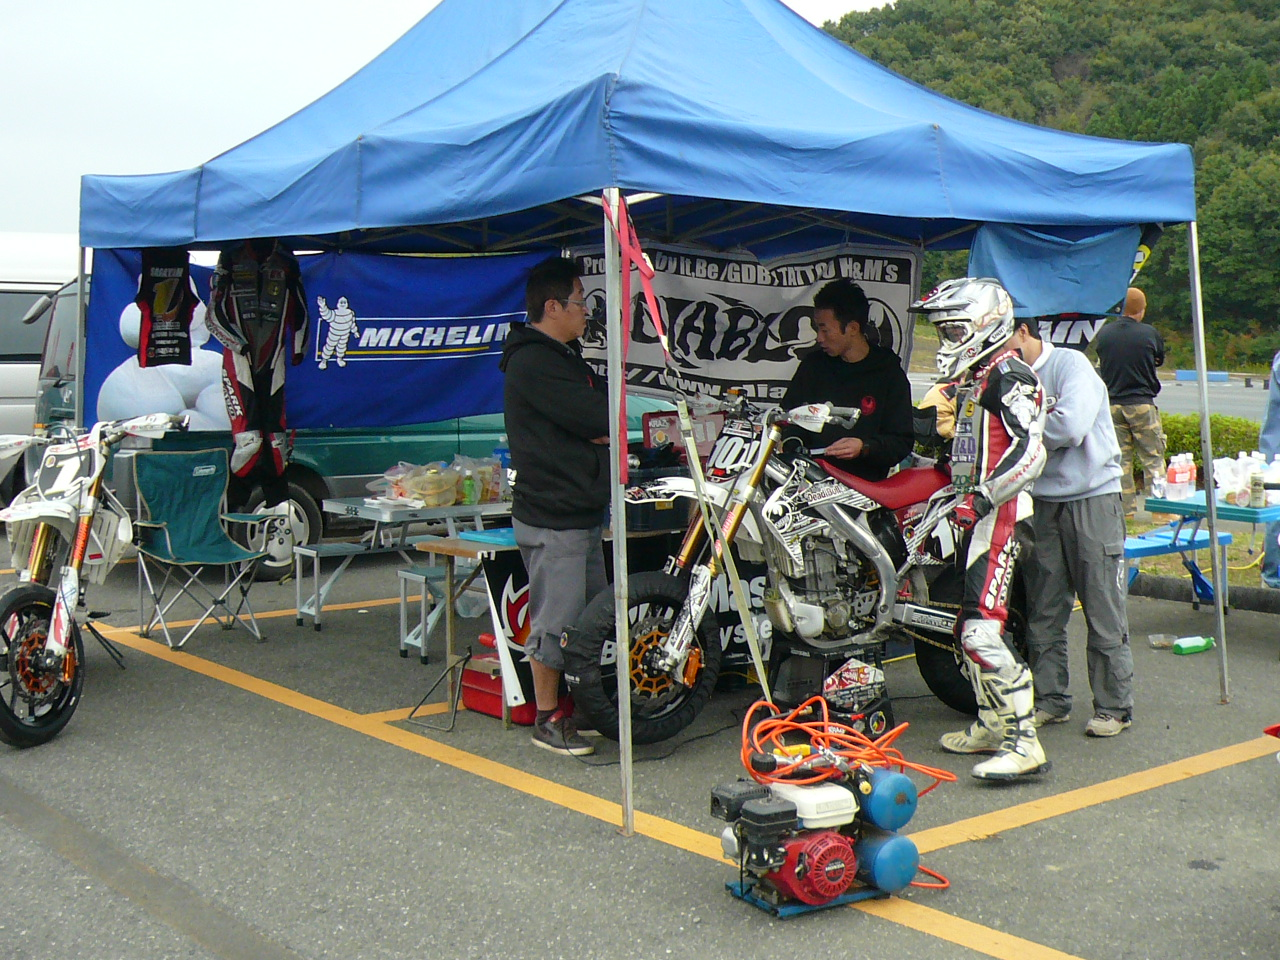 http://img.blogs.yahoo.co.jp/ybi/1/13/f5/tetsutaro499/folder/420377/img_420377_44994071_9?1225592279